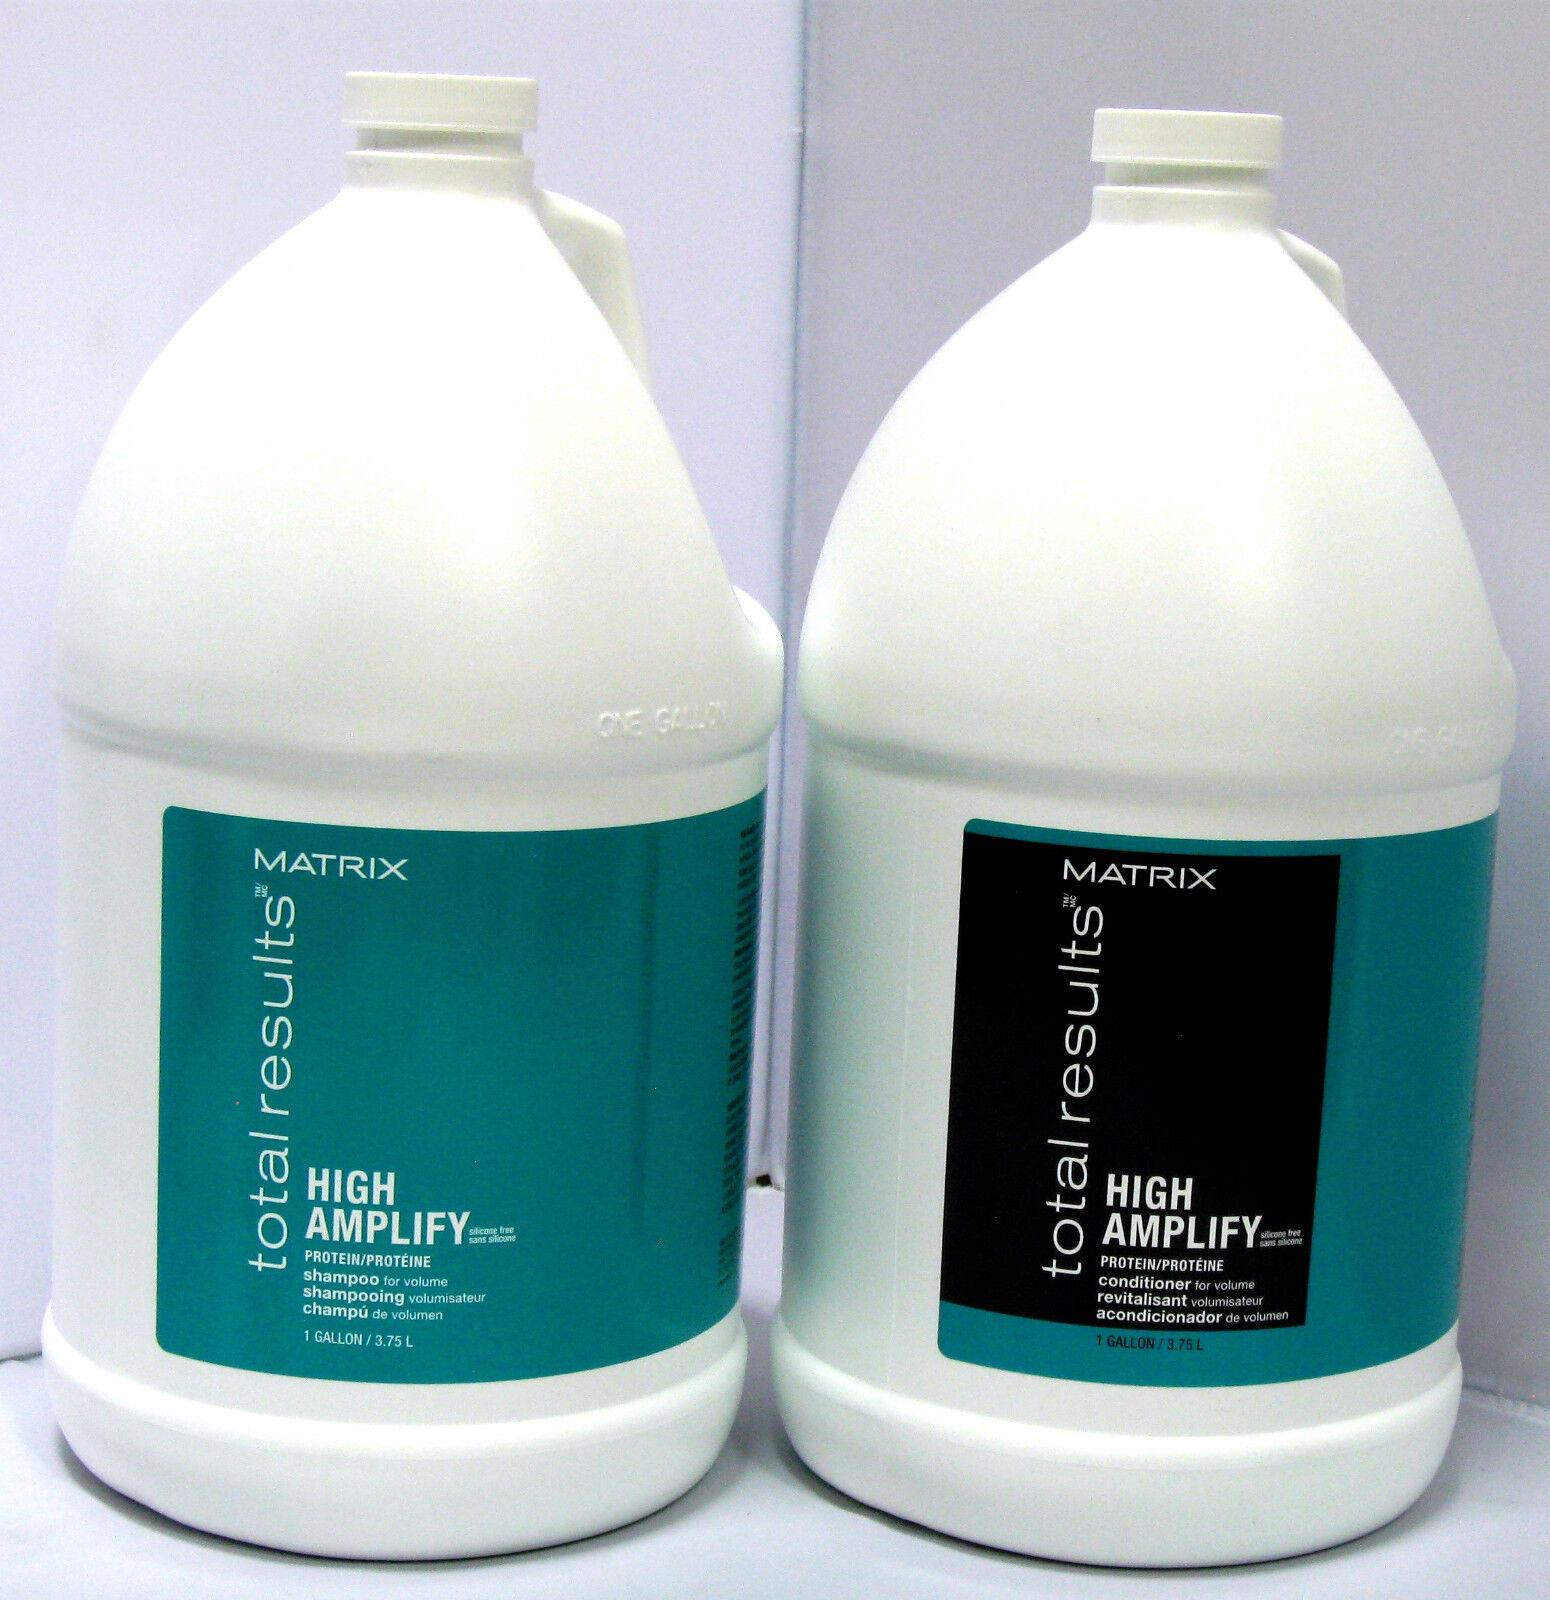 Matrix High Amplify Shampoo & Conditioner Gallon Set Total Results Silicone Free